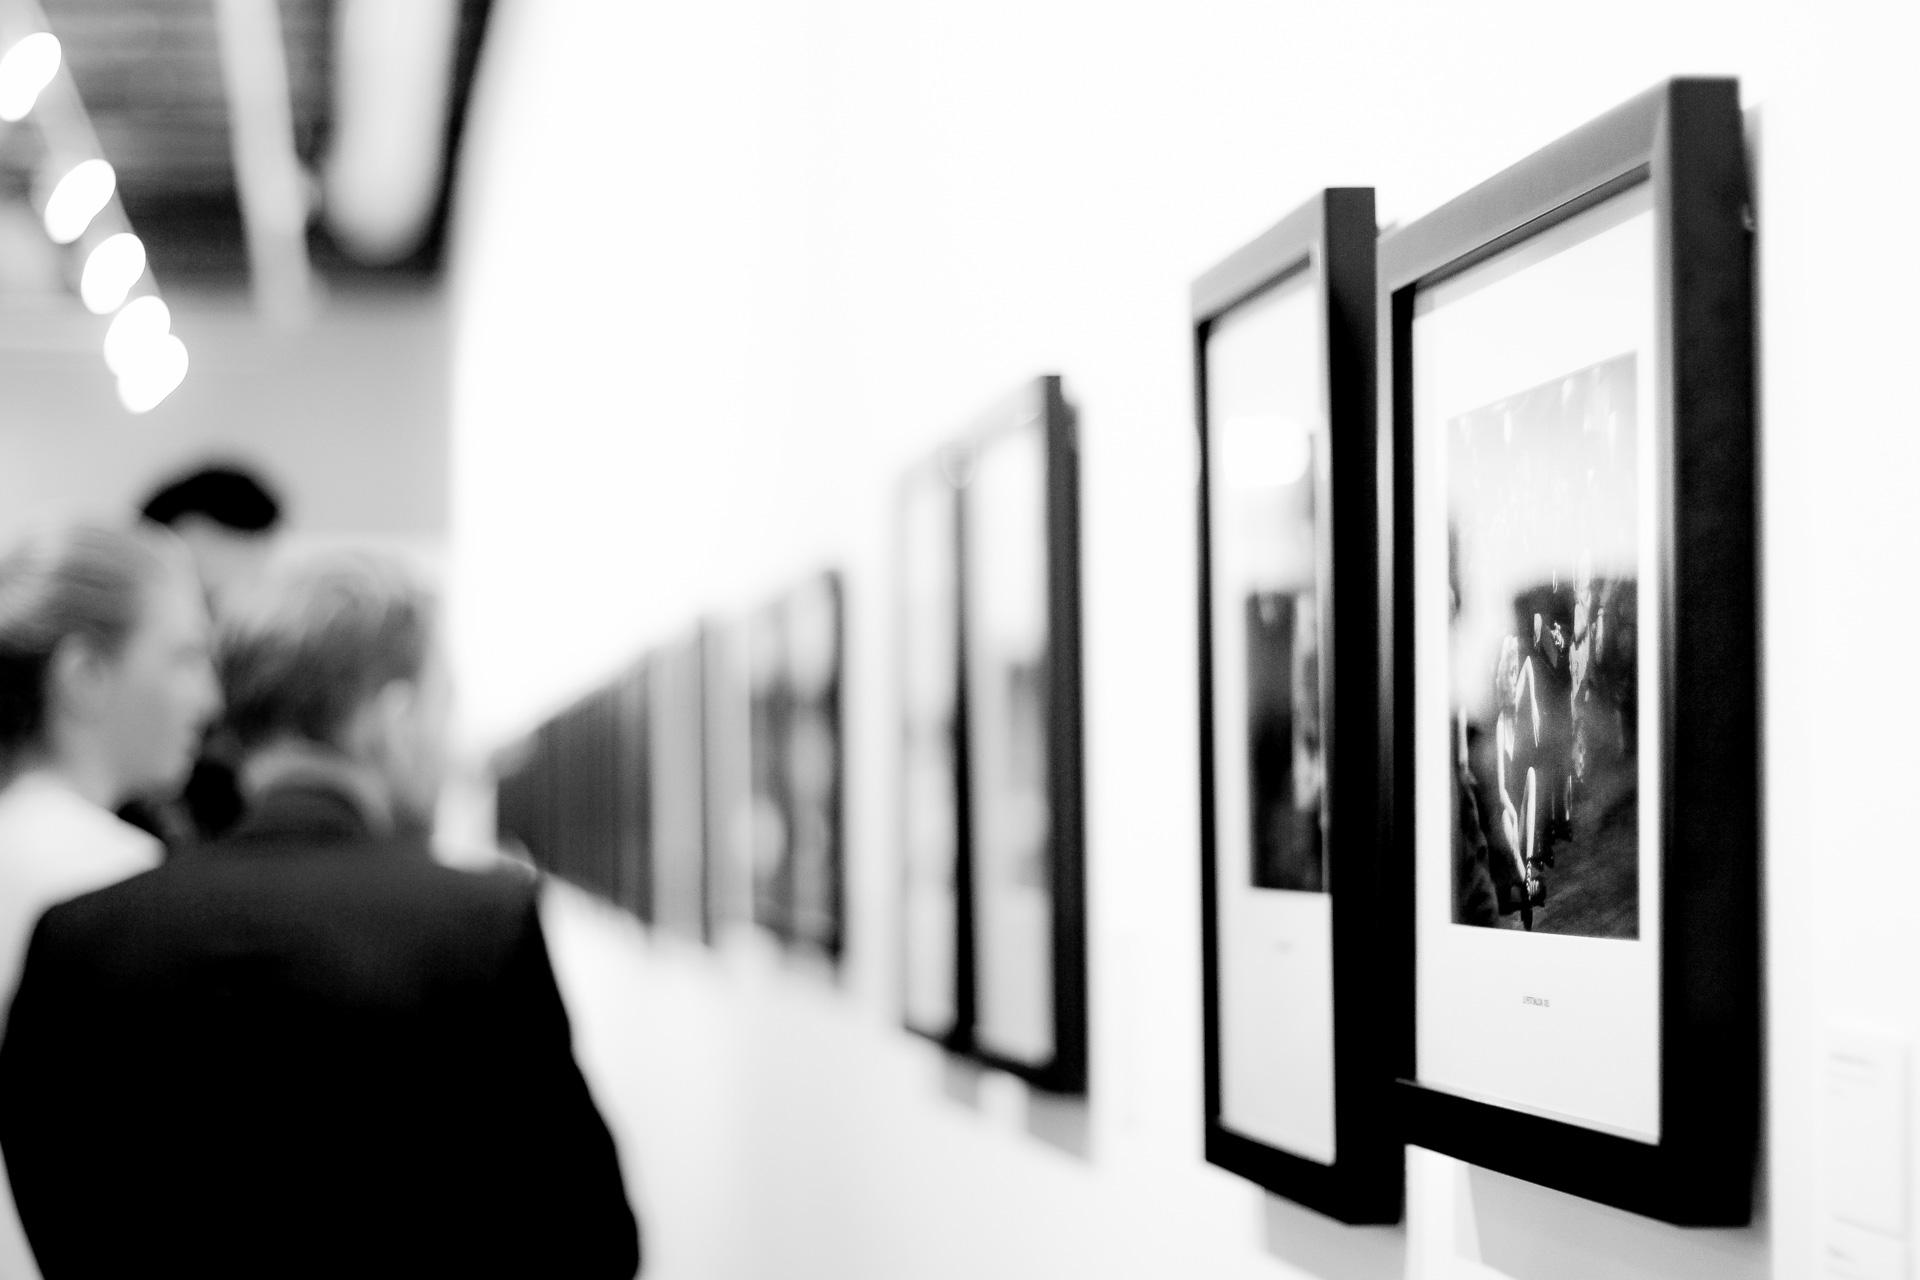 Exhibition in Dubai 2015